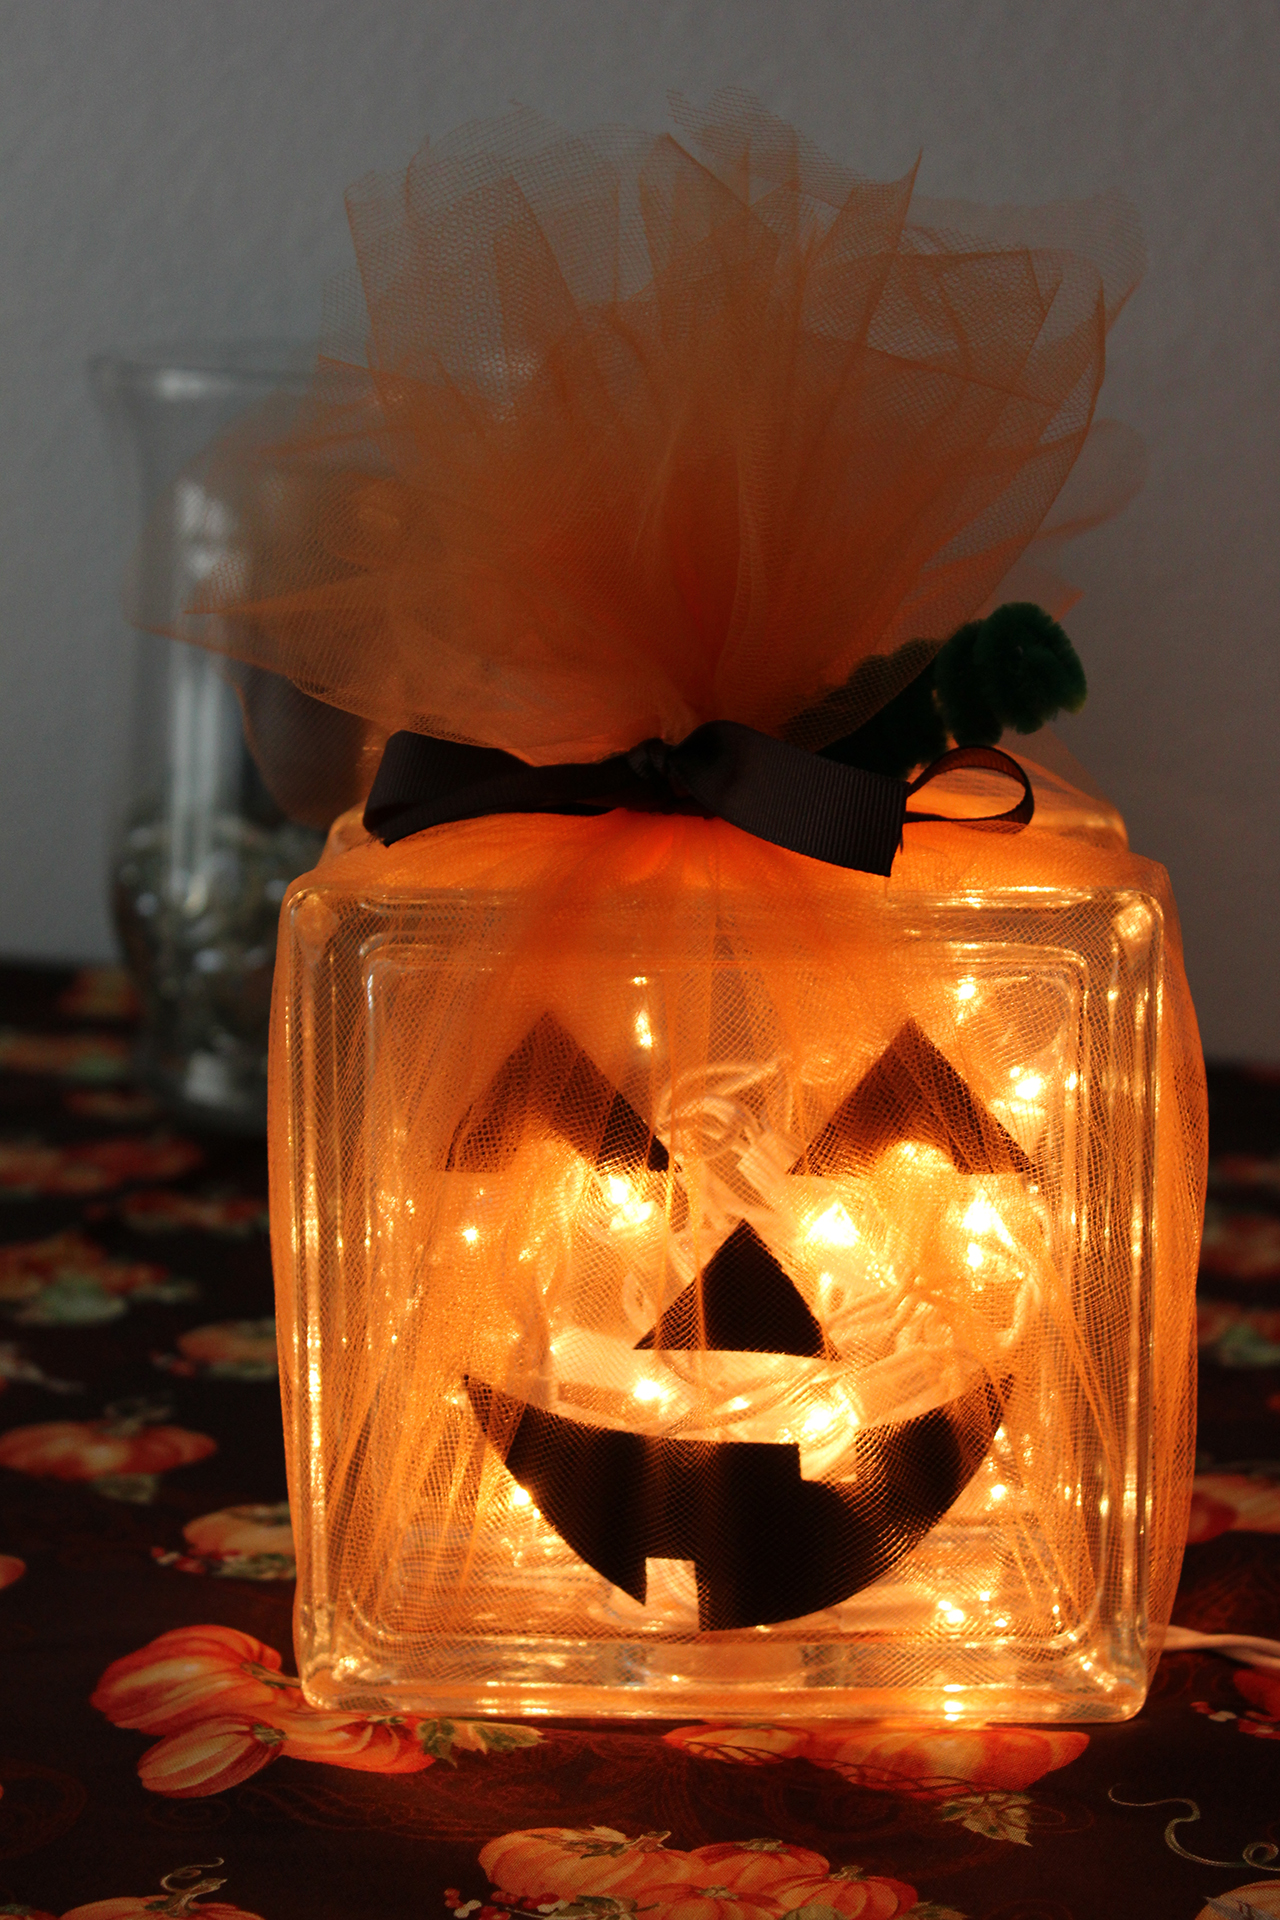 Halloween indoor decorations ideas - 5 Glass Pumpkins Still Shine Bright